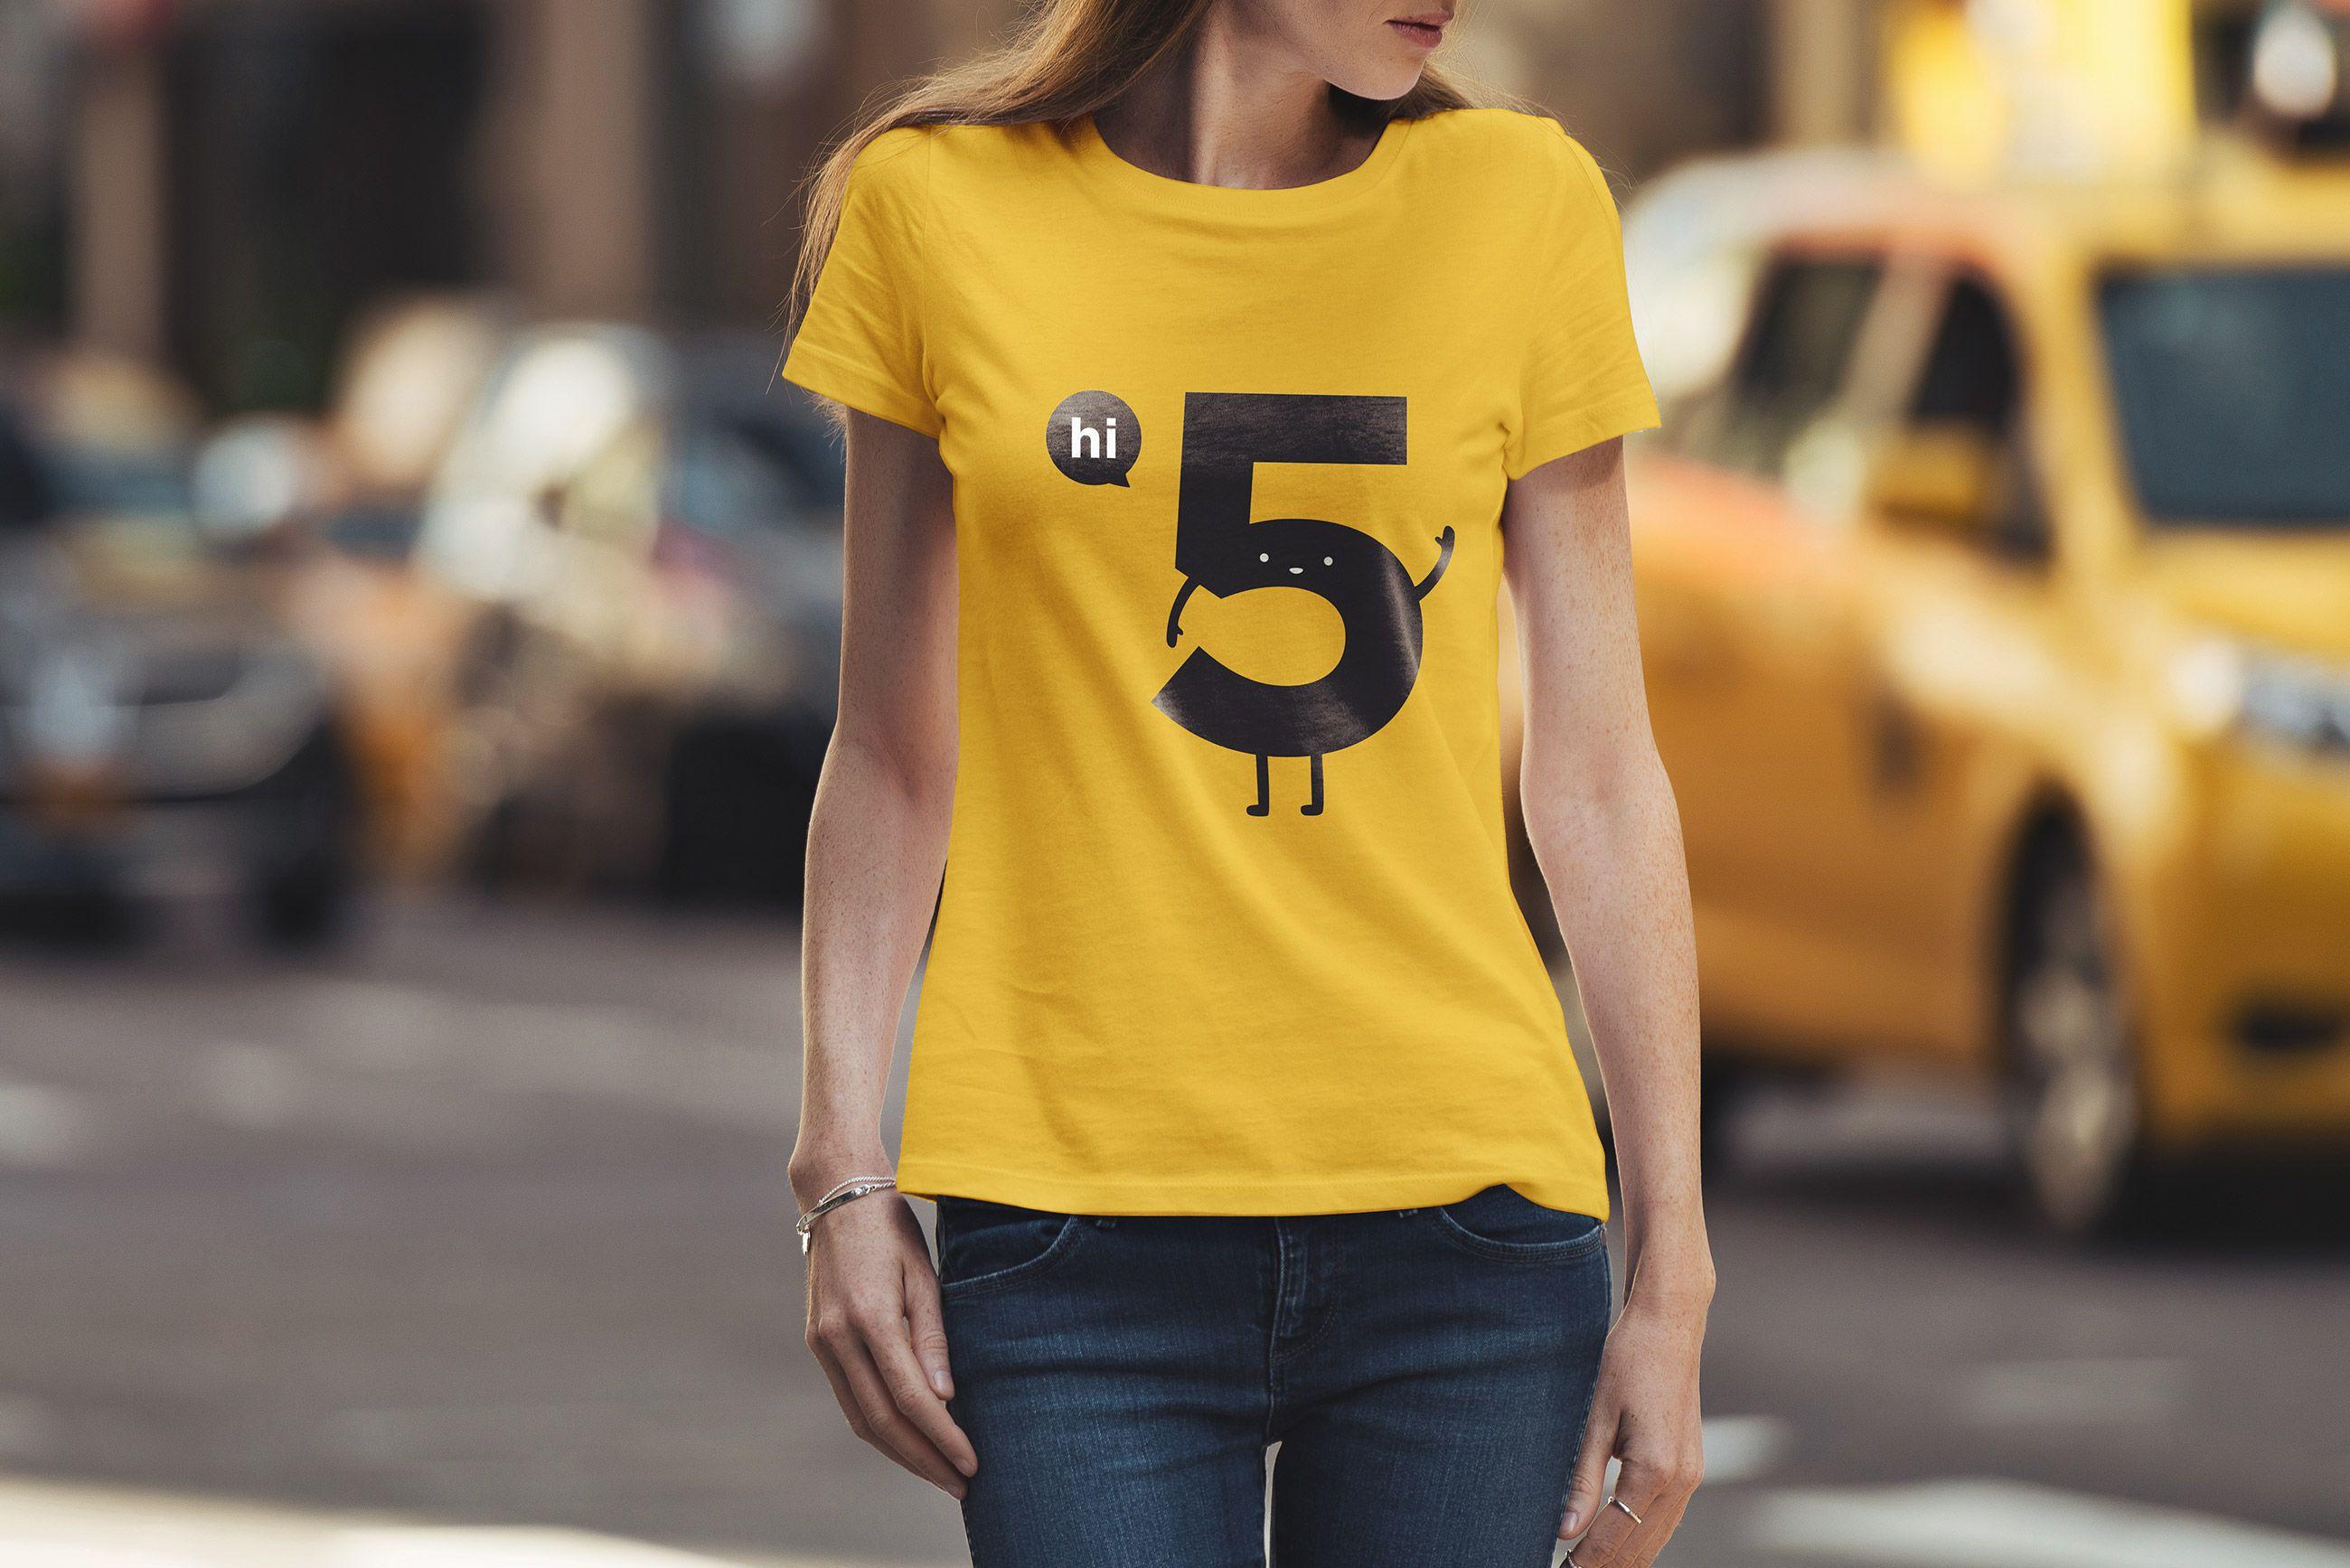 Download T Shirt Mockup Urban Edition Vol 2 Shirt Mockup T Shirt Design Template Tshirt Mockup